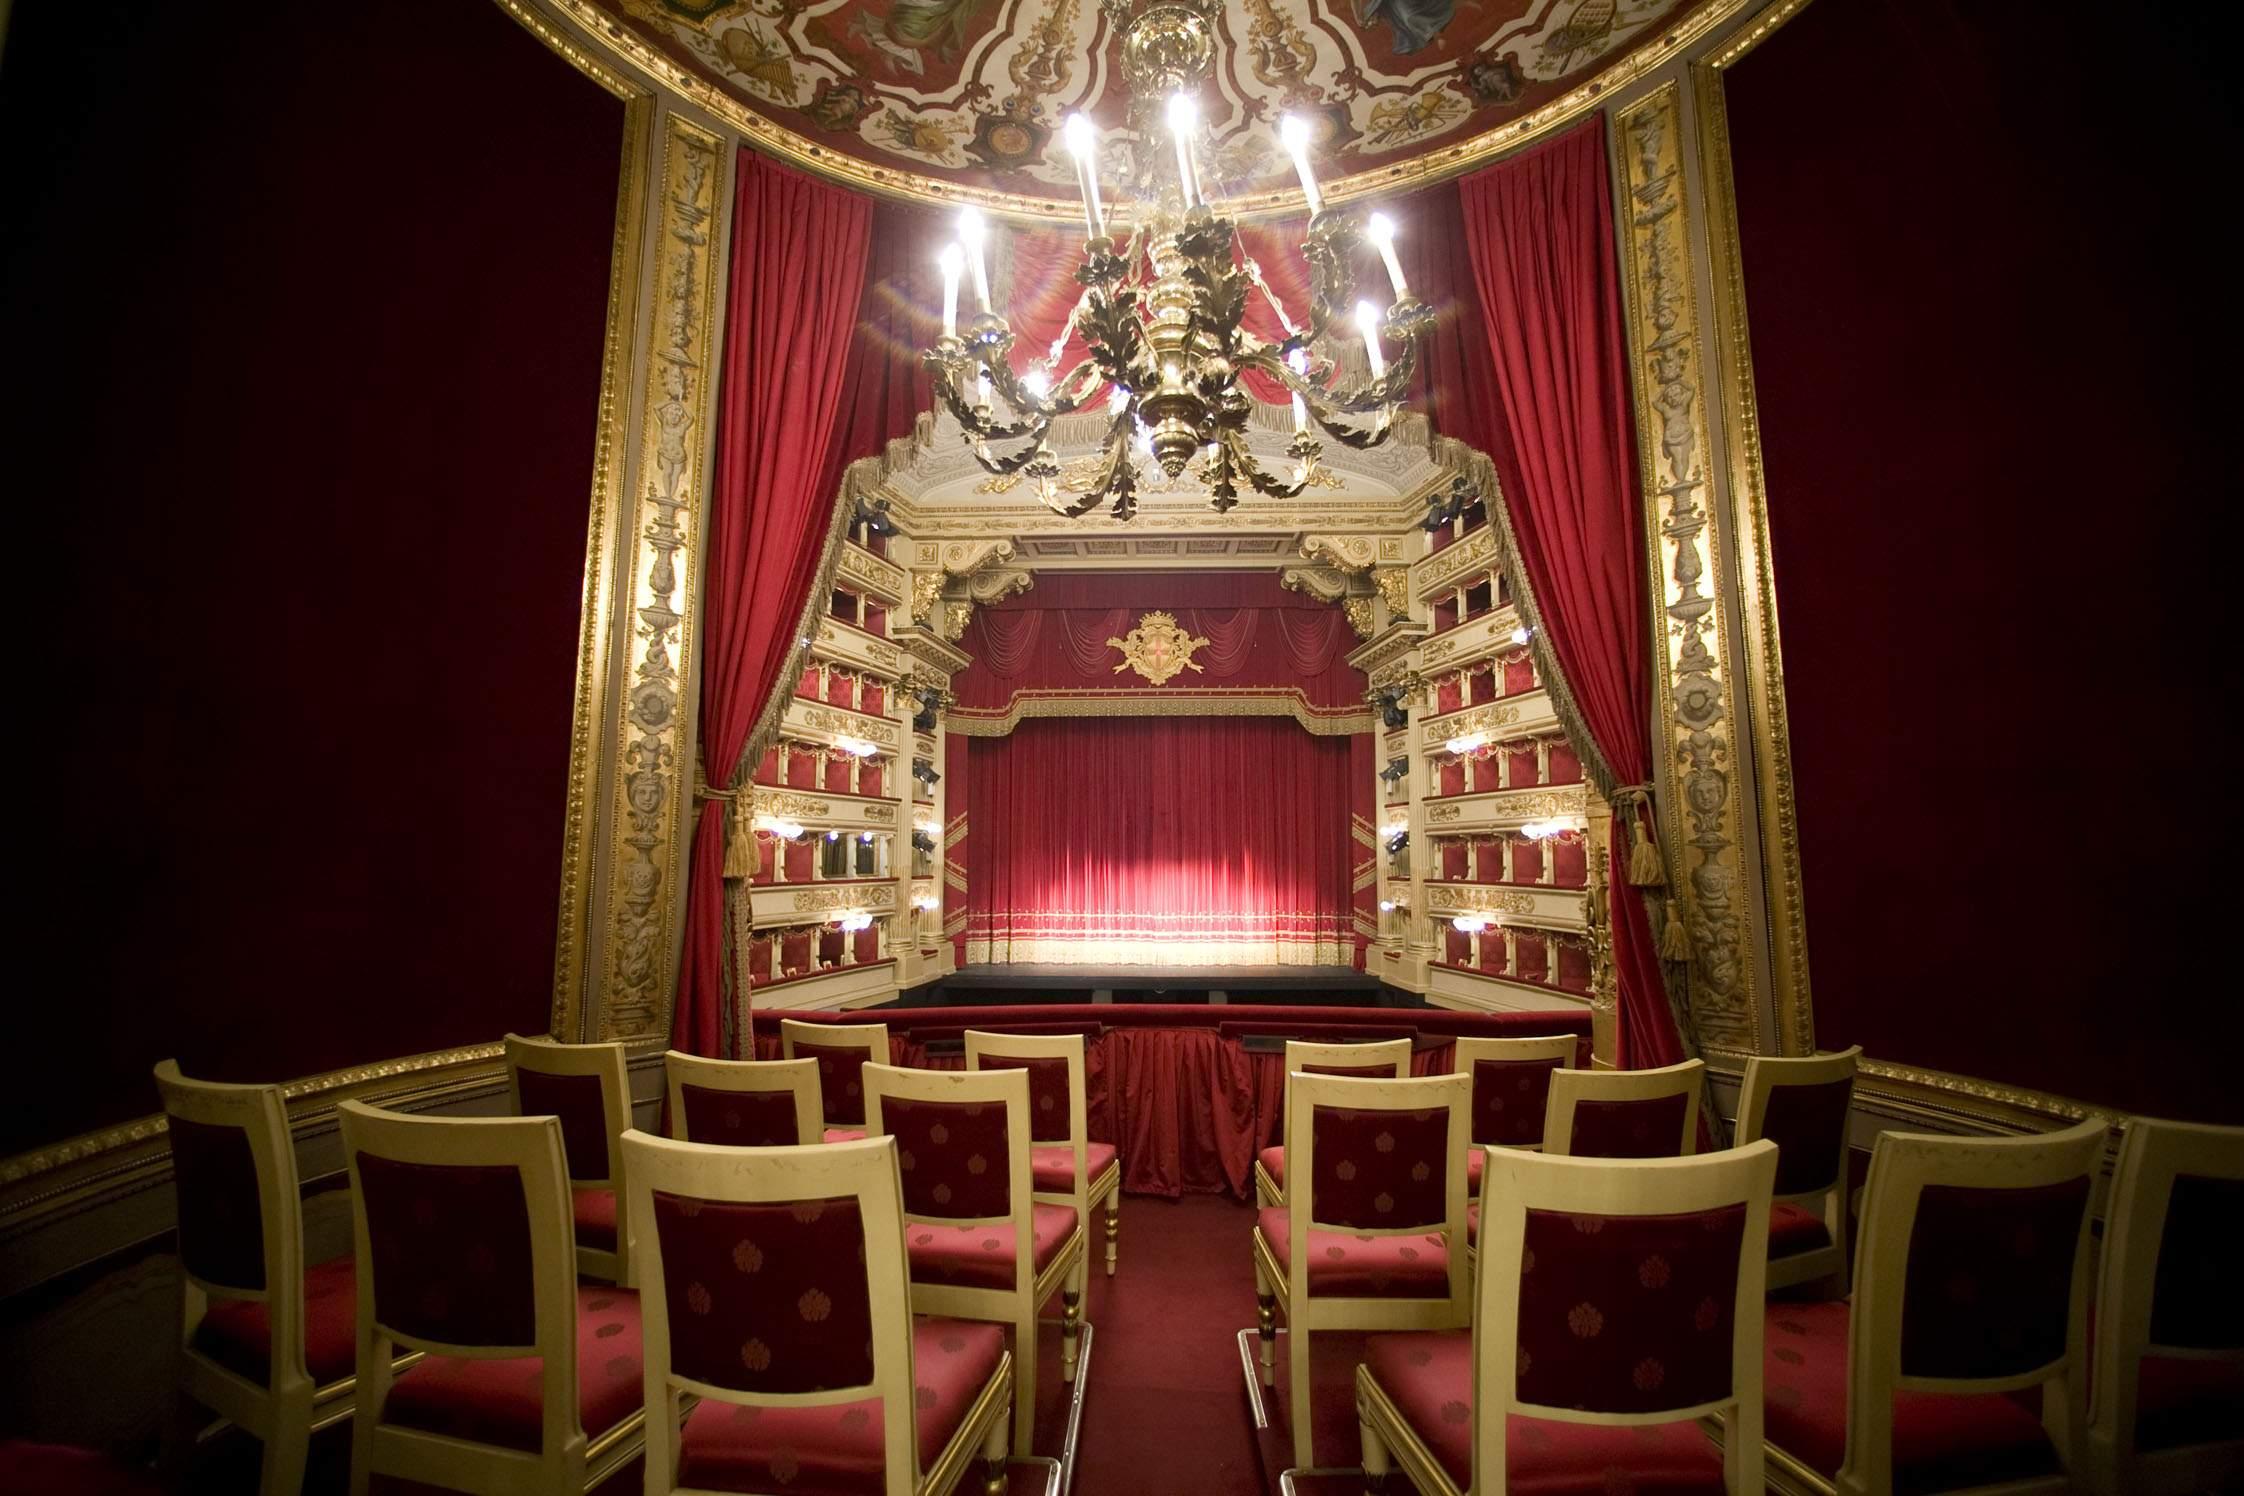 La scala opera house pictures